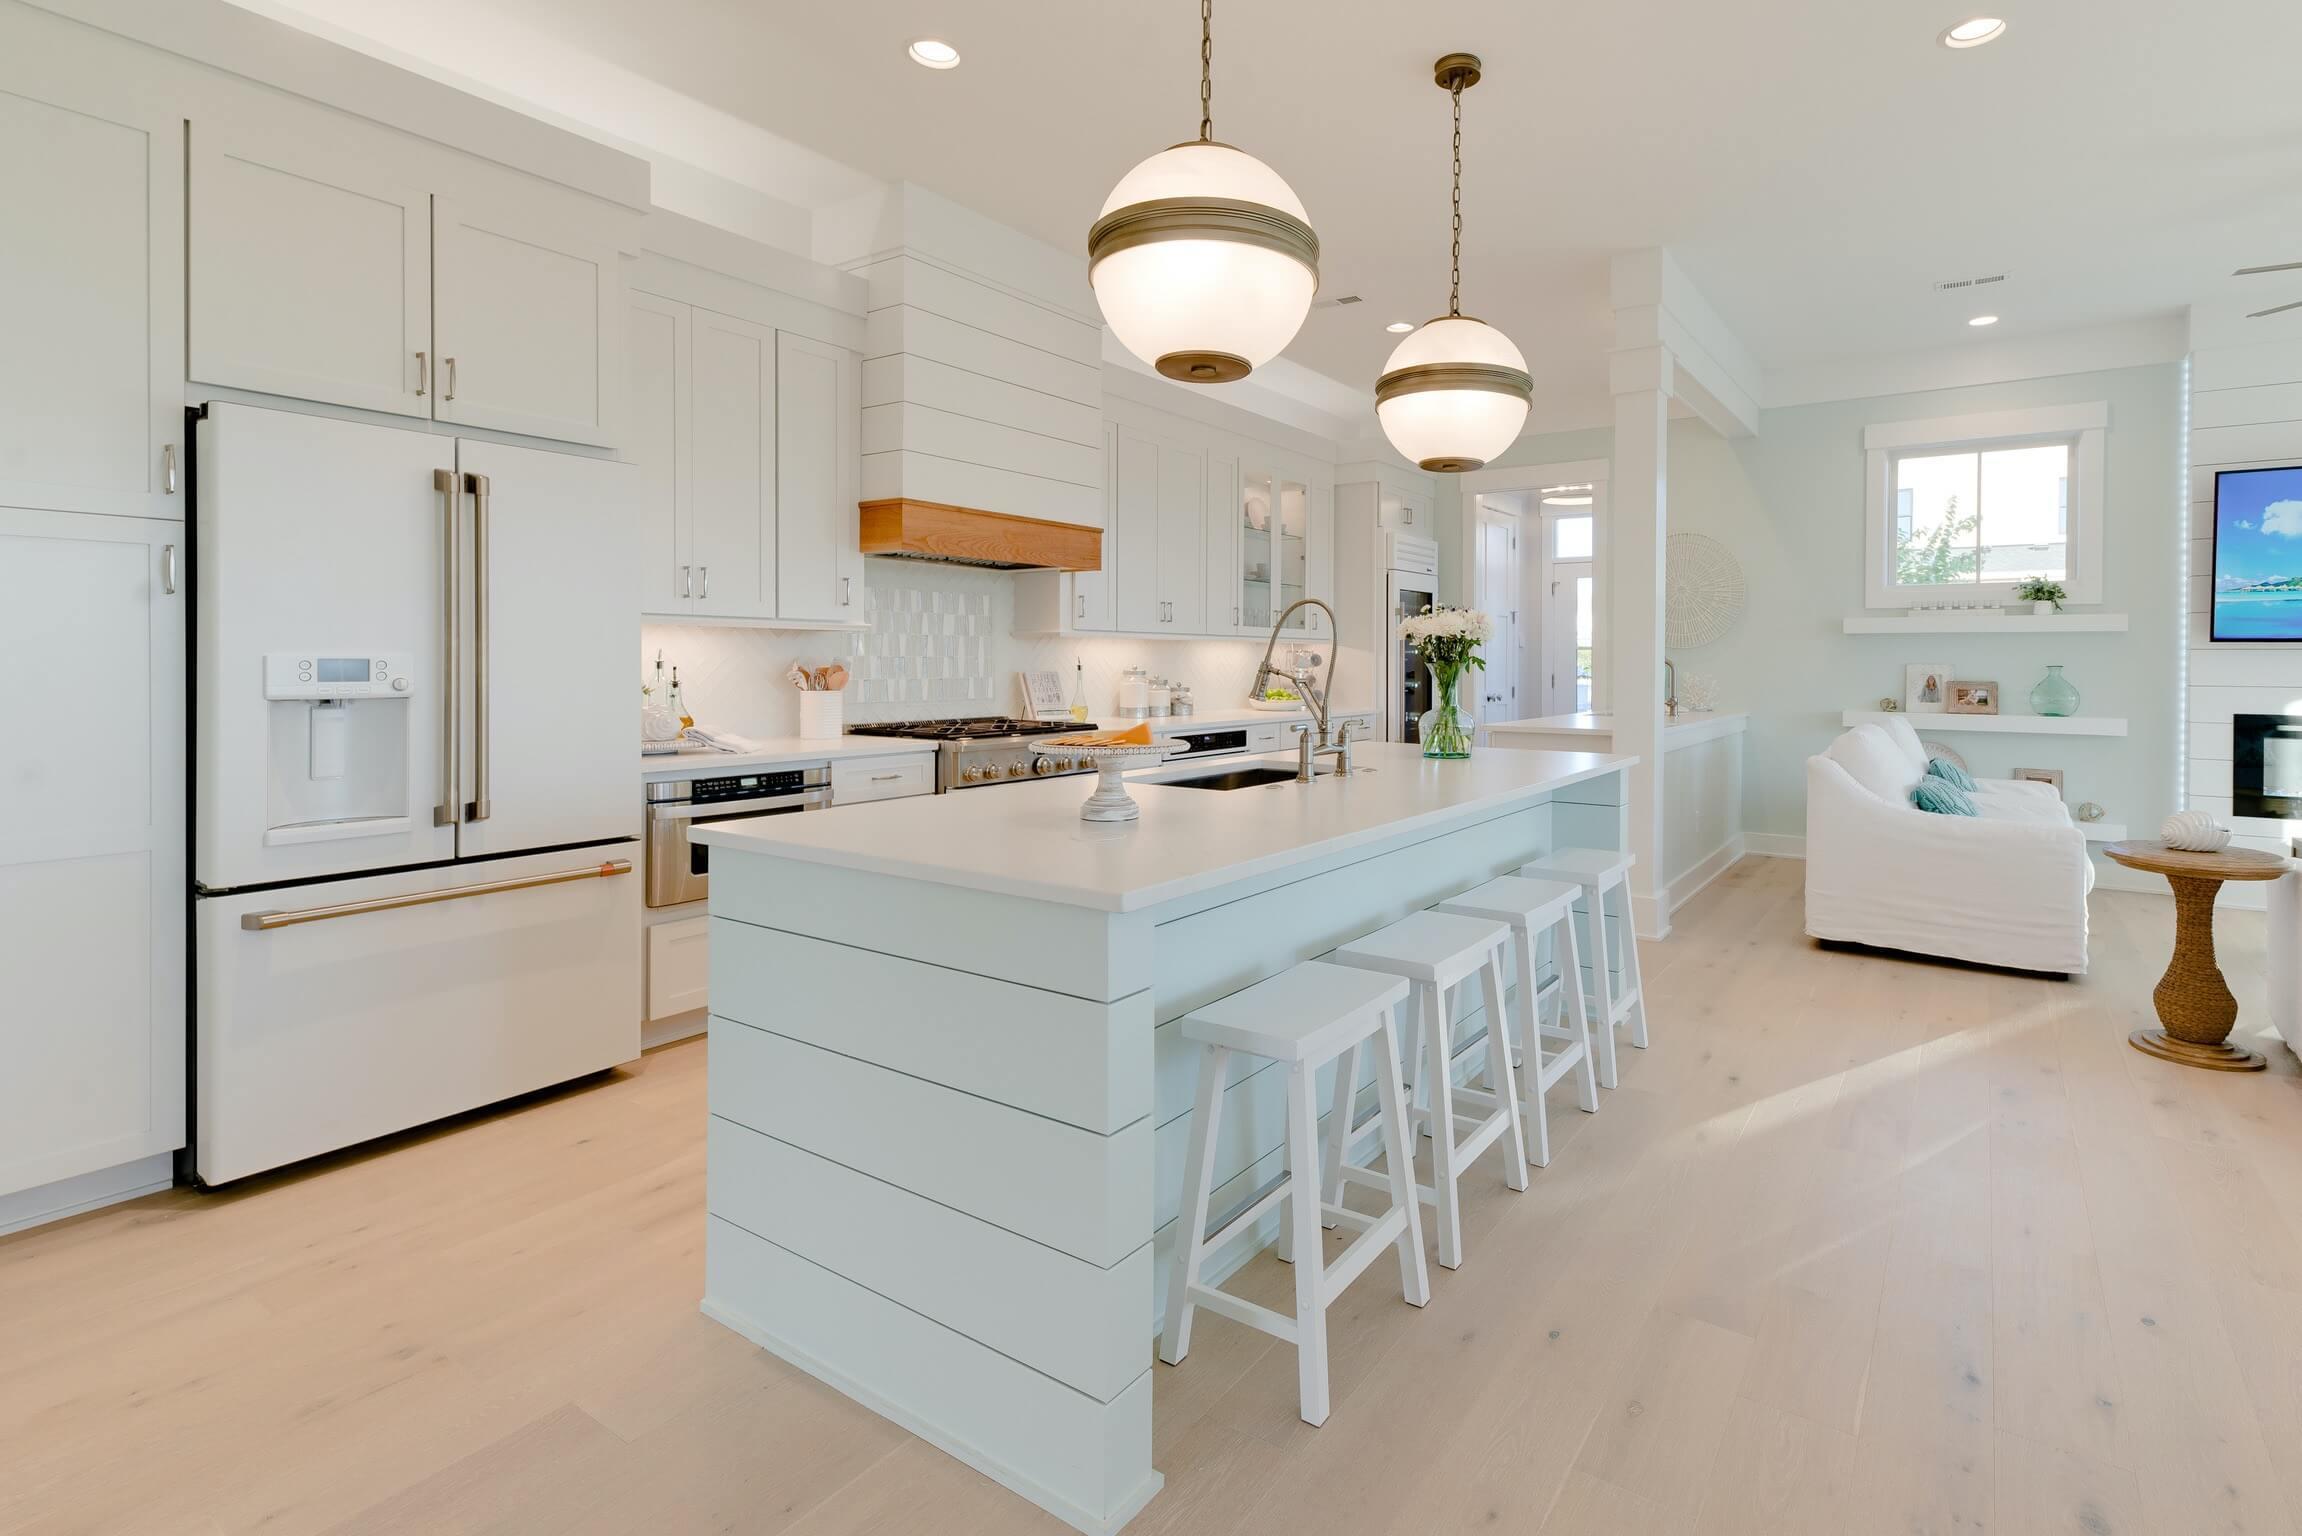 Kitchen featured in the Bar Harbor By Stephen Alexander Homes in Norfolk-Newport News, VA